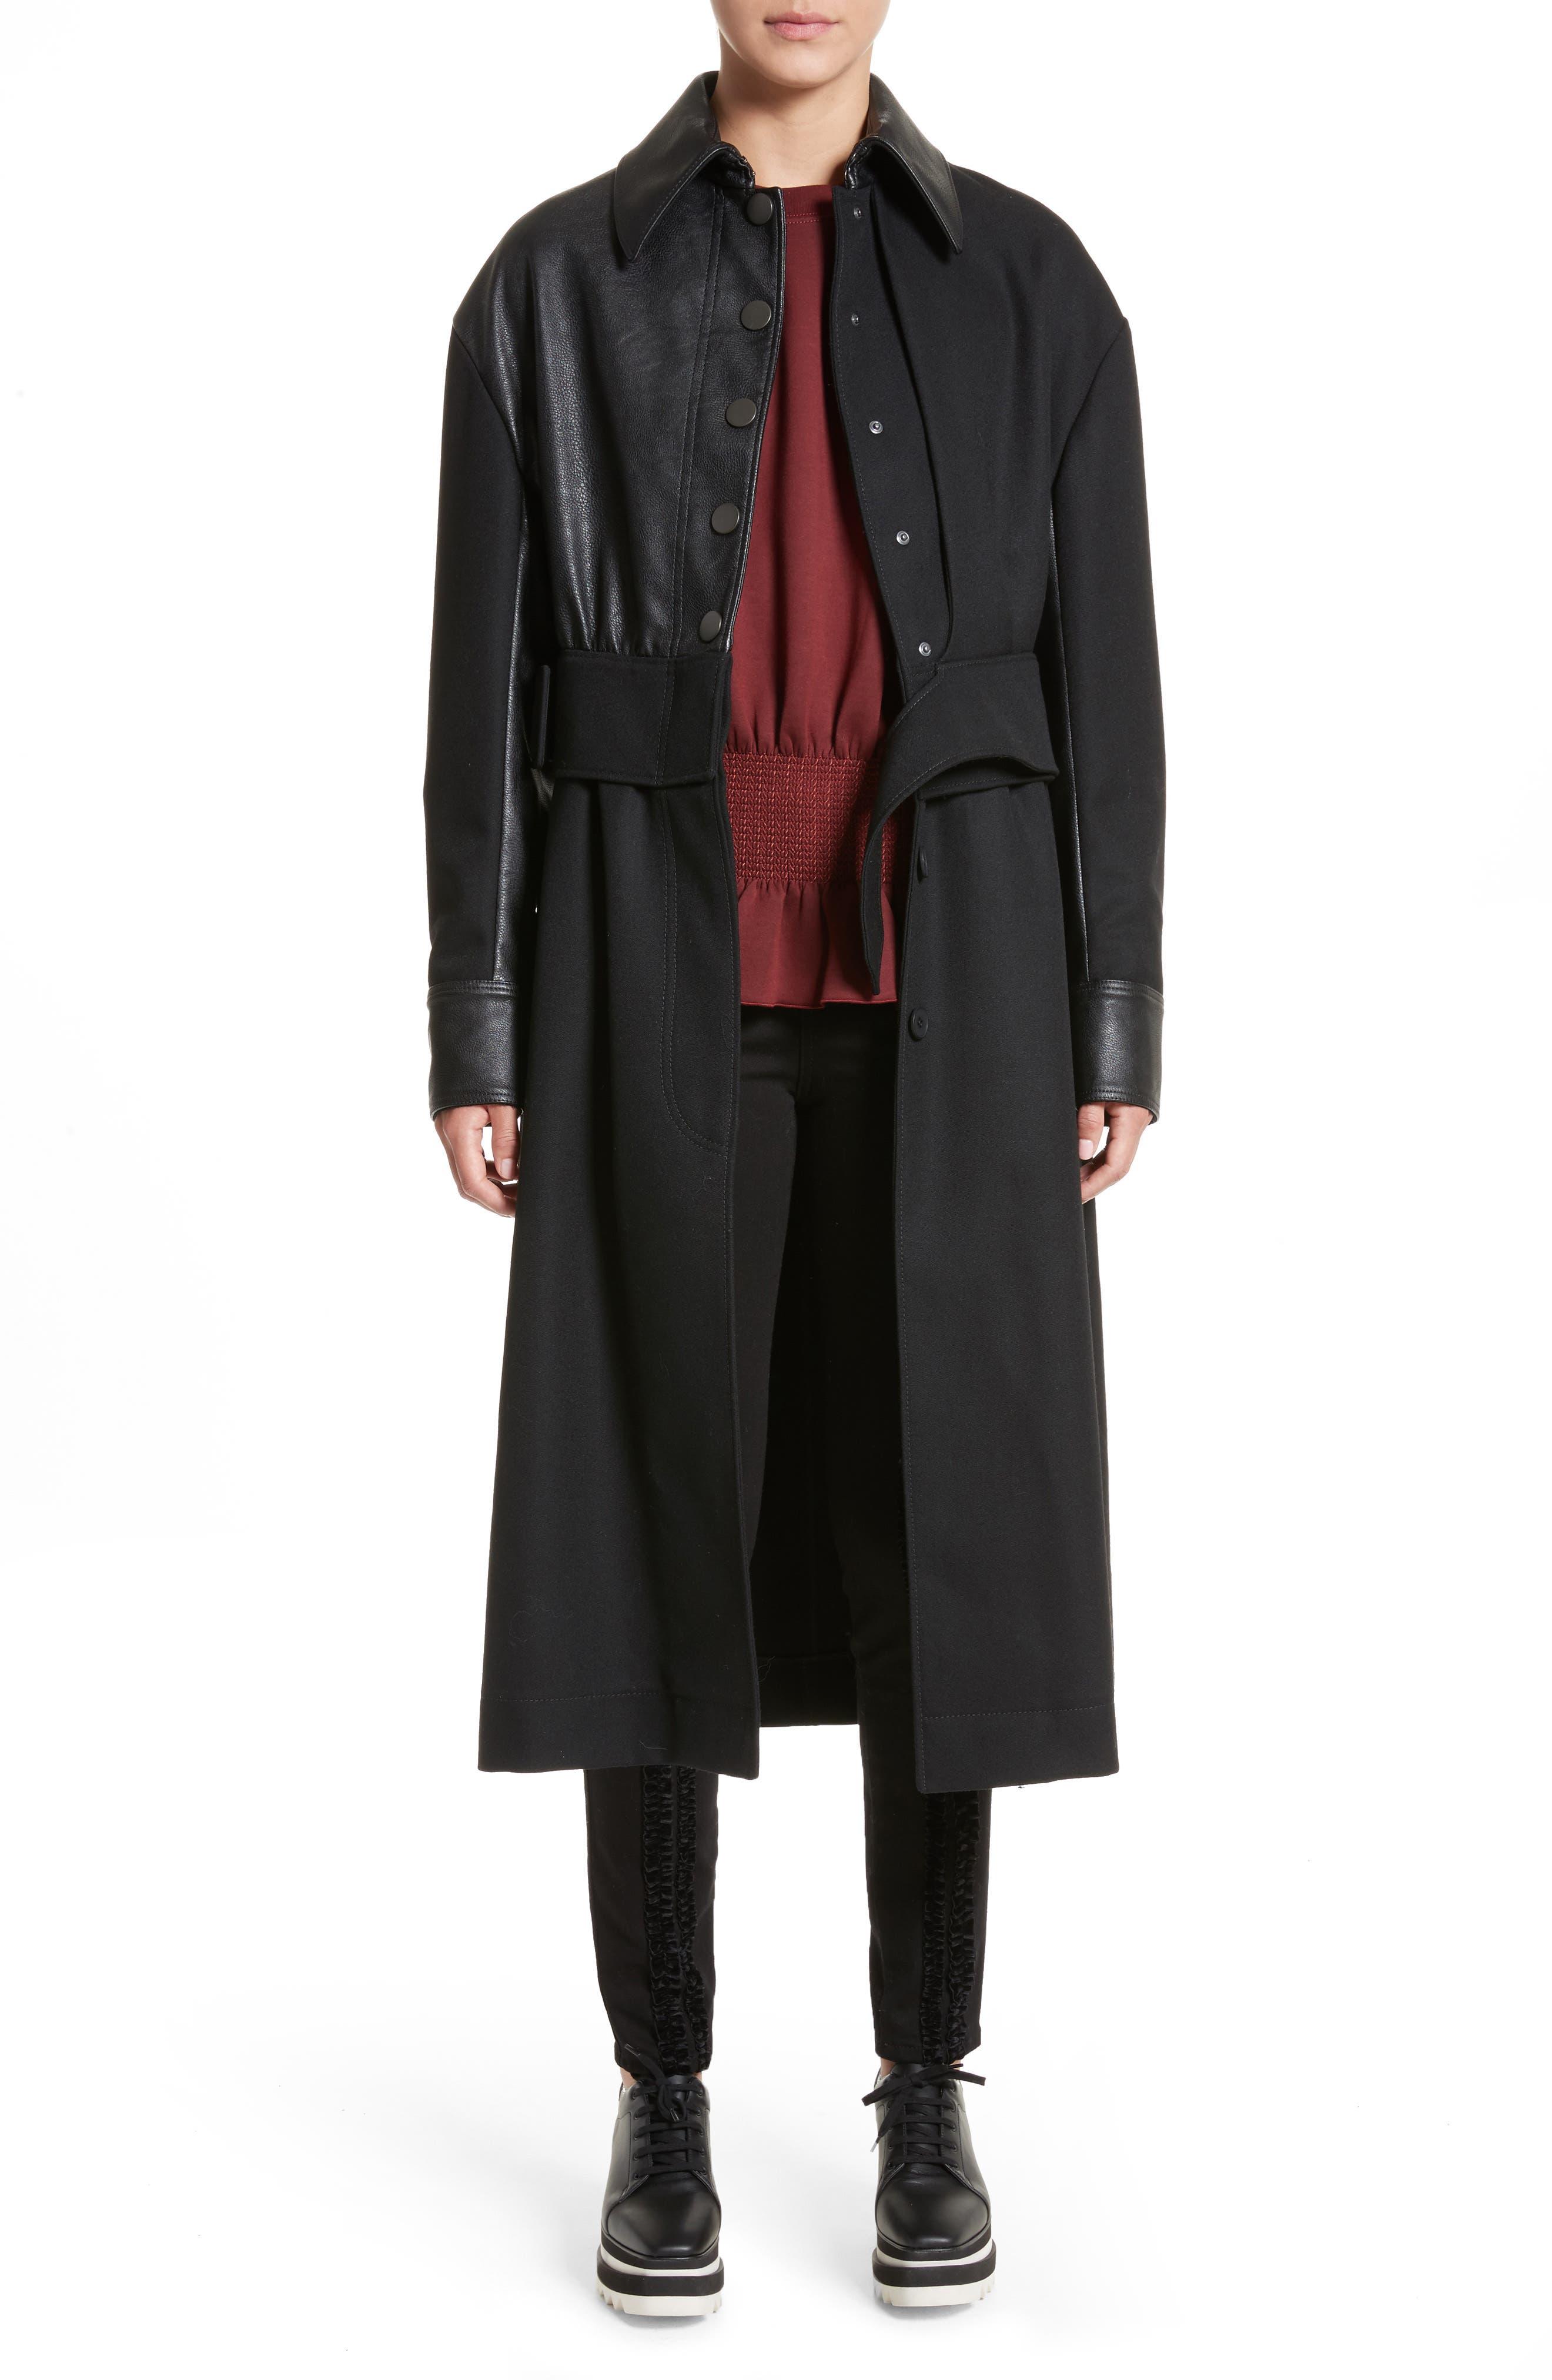 Eden Alter Leather Trim Wool Coat,                         Main,                         color, Black